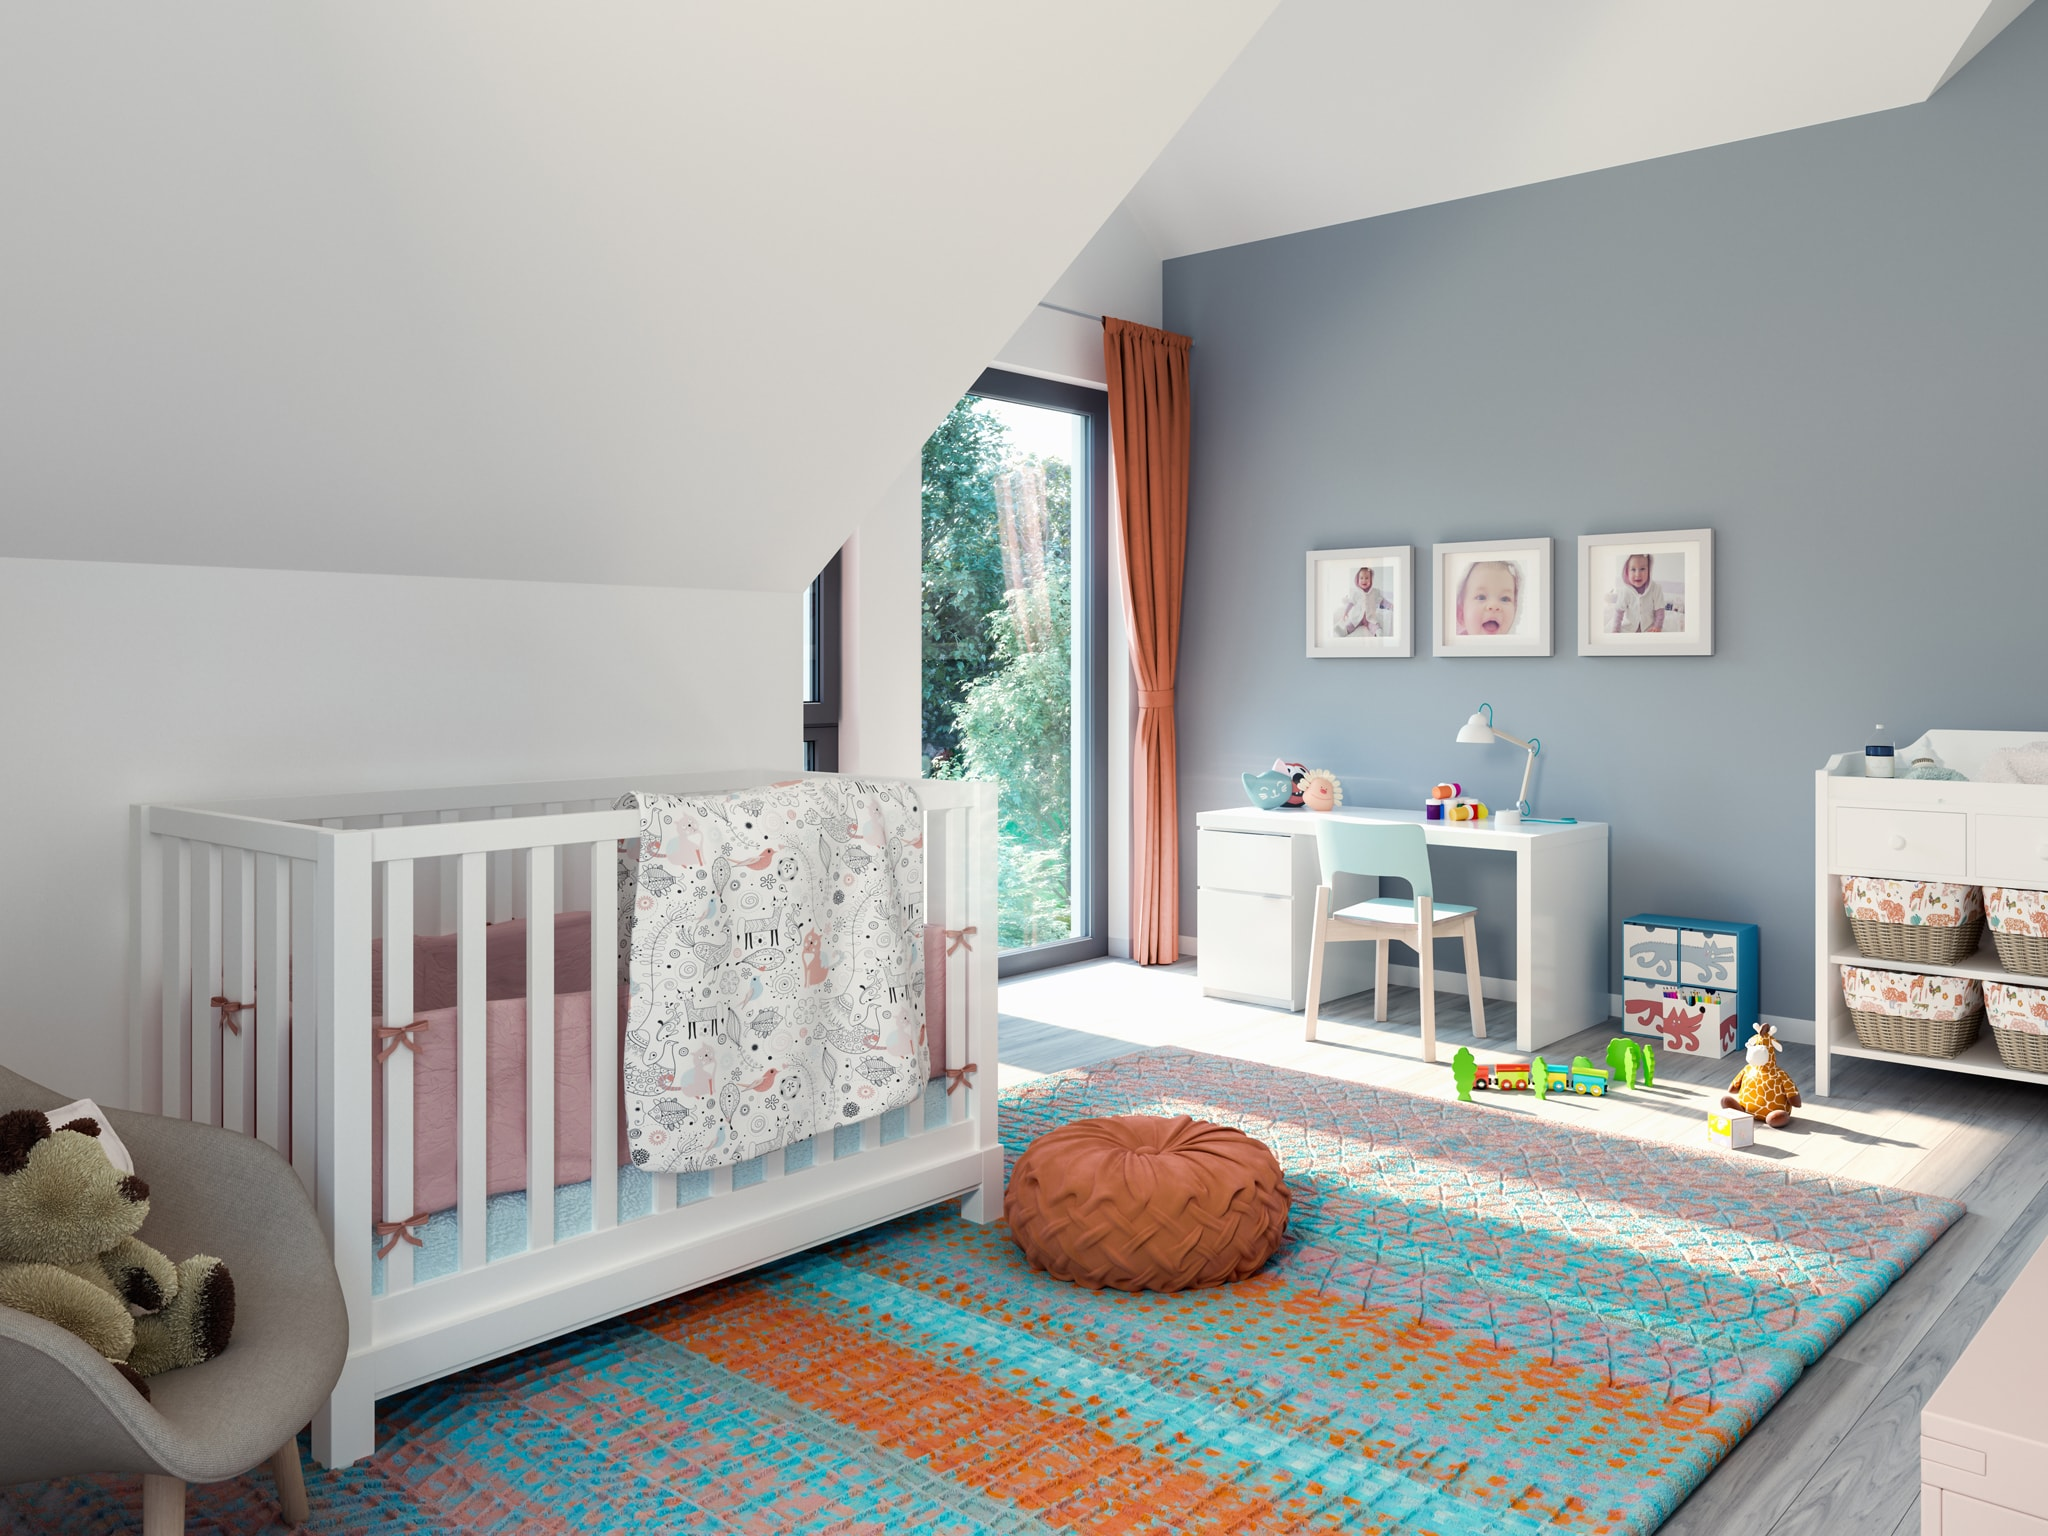 Kinderzimmer - Ideen Inneneinrichtung Einfamilienhaus Living Haus SUNSHINE 144 V4 - HausbauDirekt.de